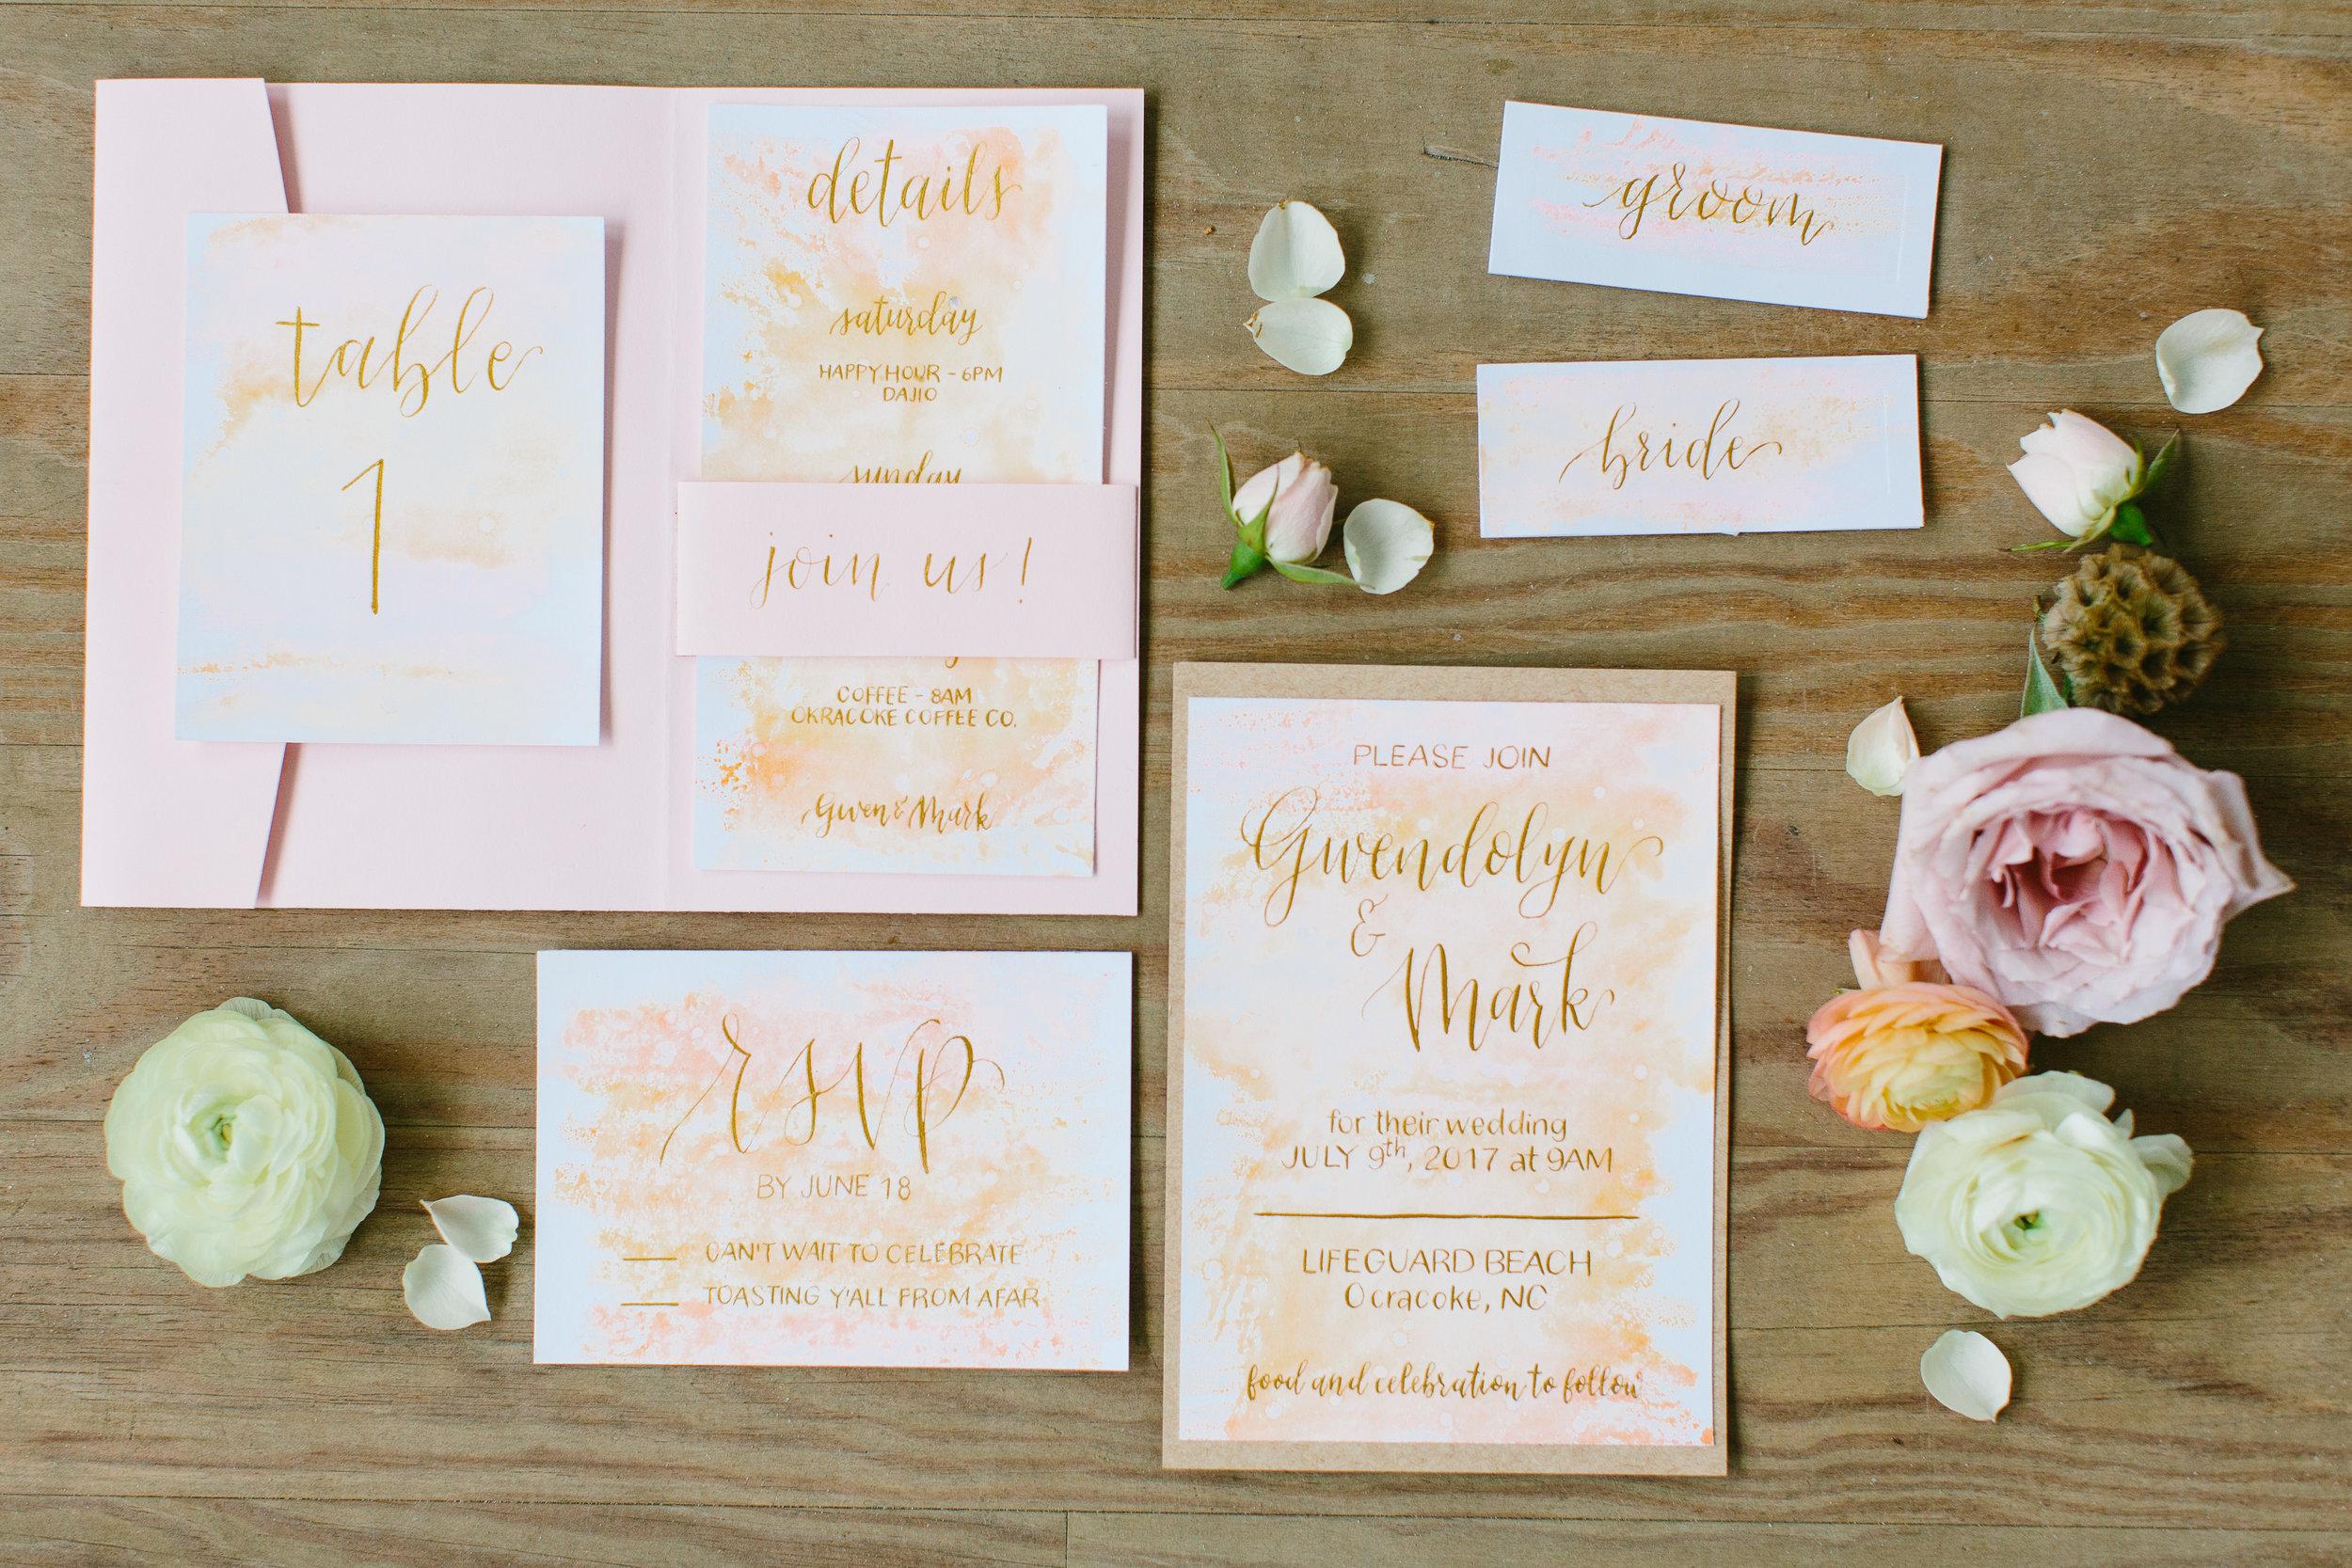 Engaged-Asheville-Joy-Unscripted-Wedding-Calligrapher-Rachael-McIntosh-Photography-8.jpg